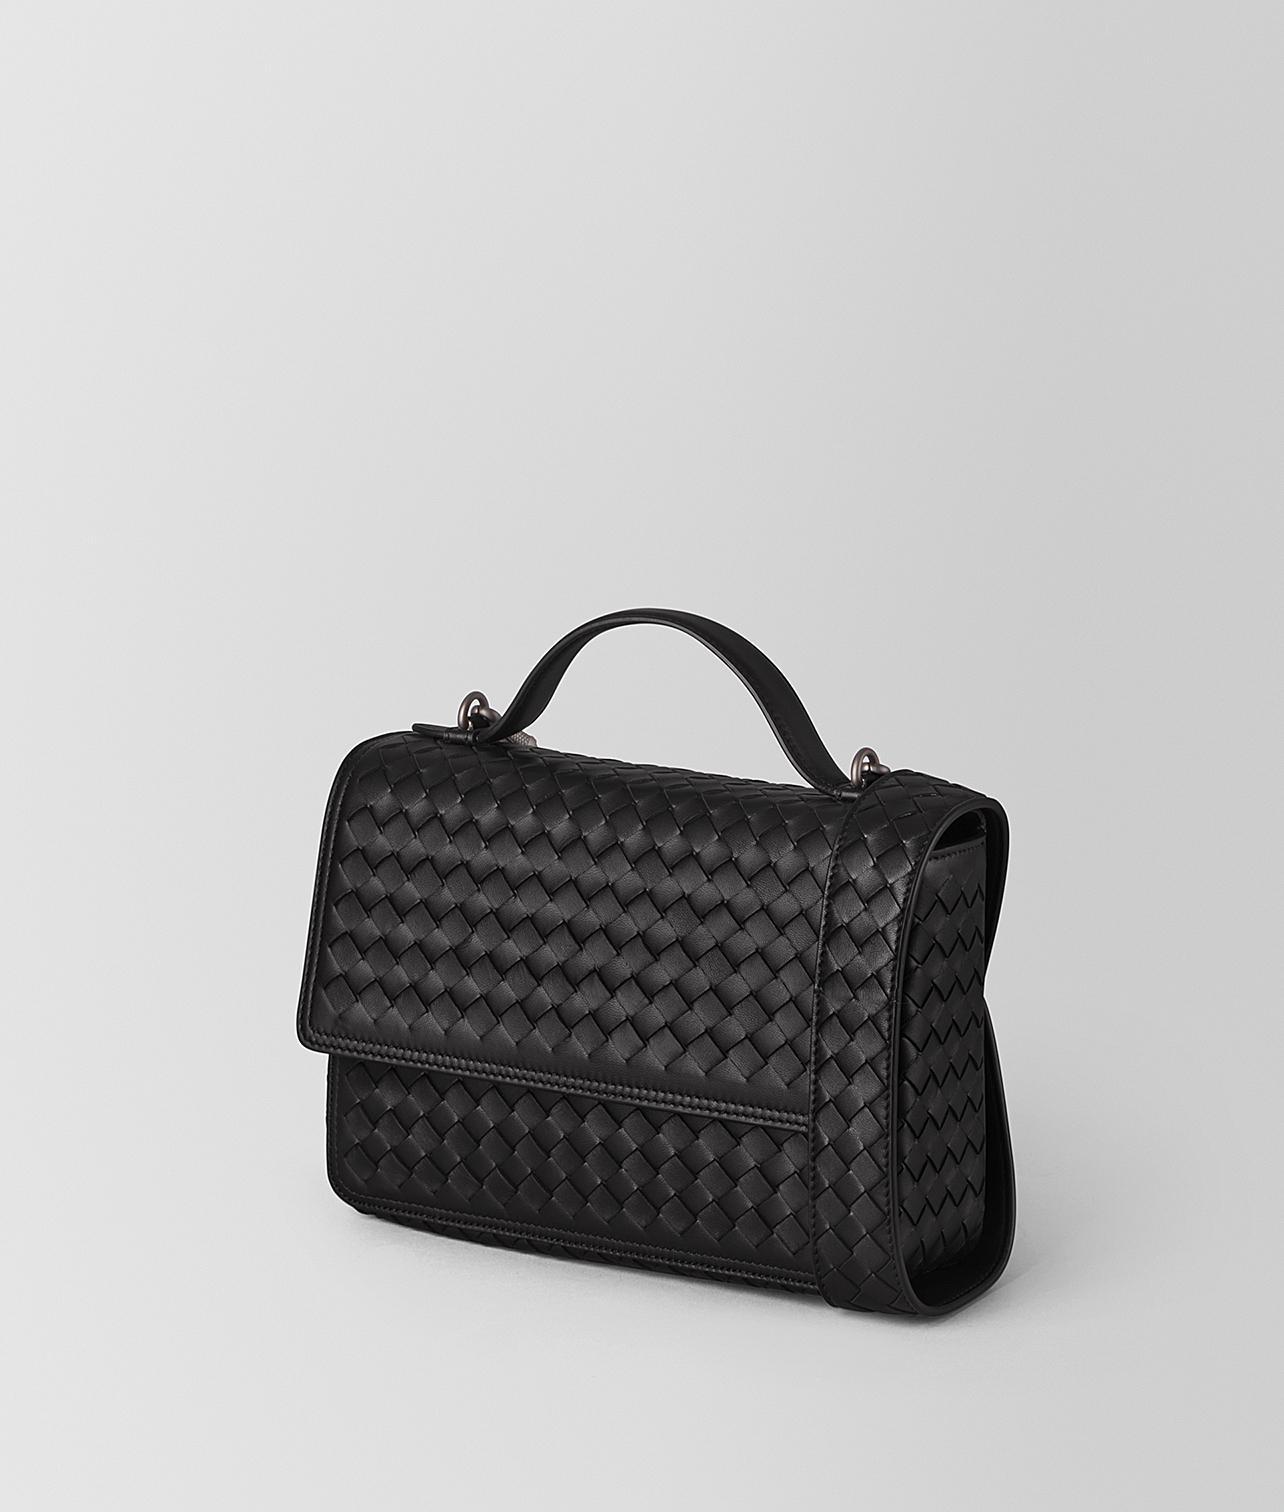 f55f5db151 Bottega Veneta Alumna Bag in Black - Lyst